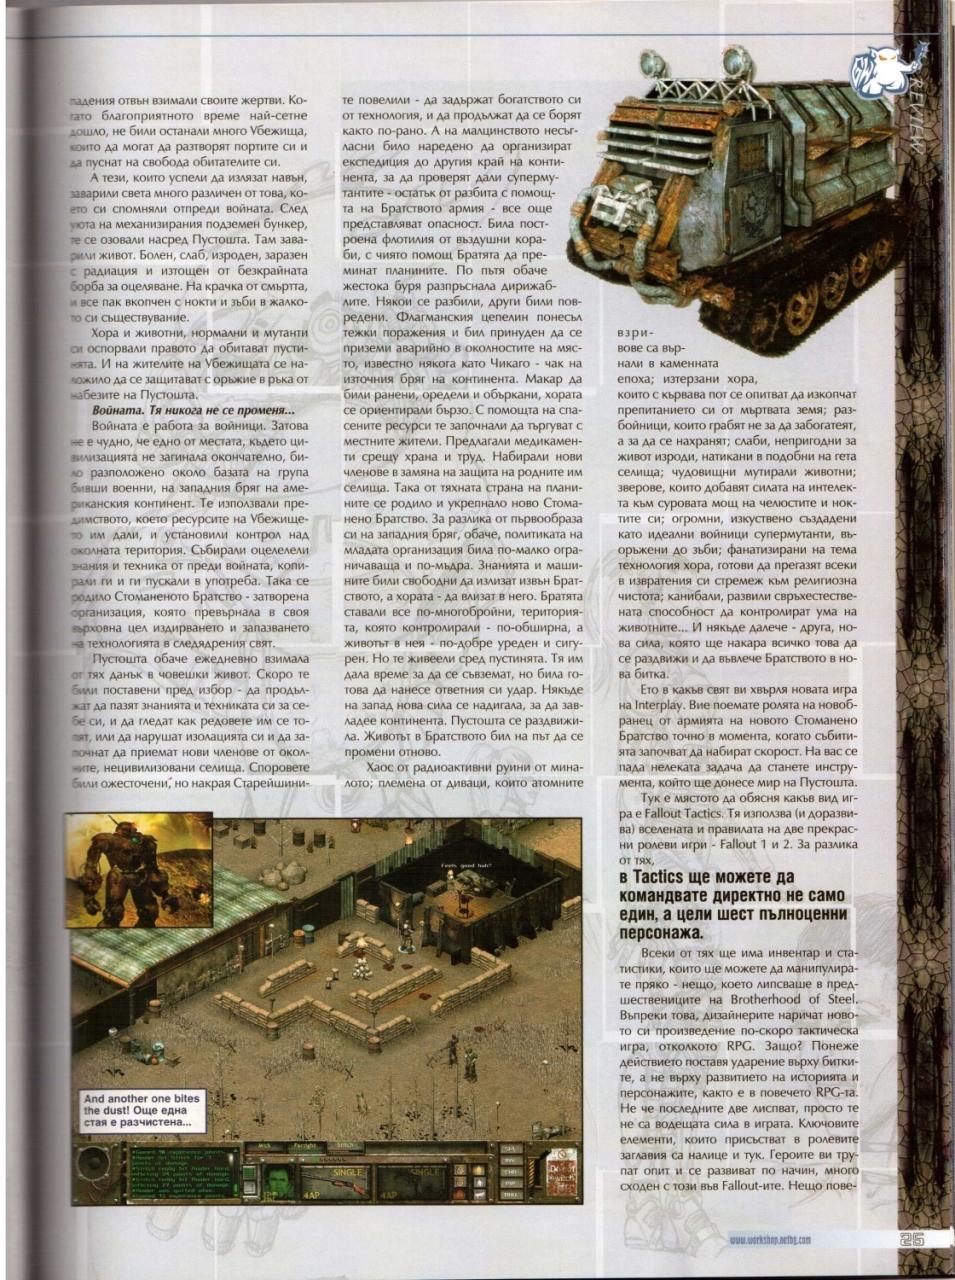 Gamer's Workshop Fallout Tactics review BG